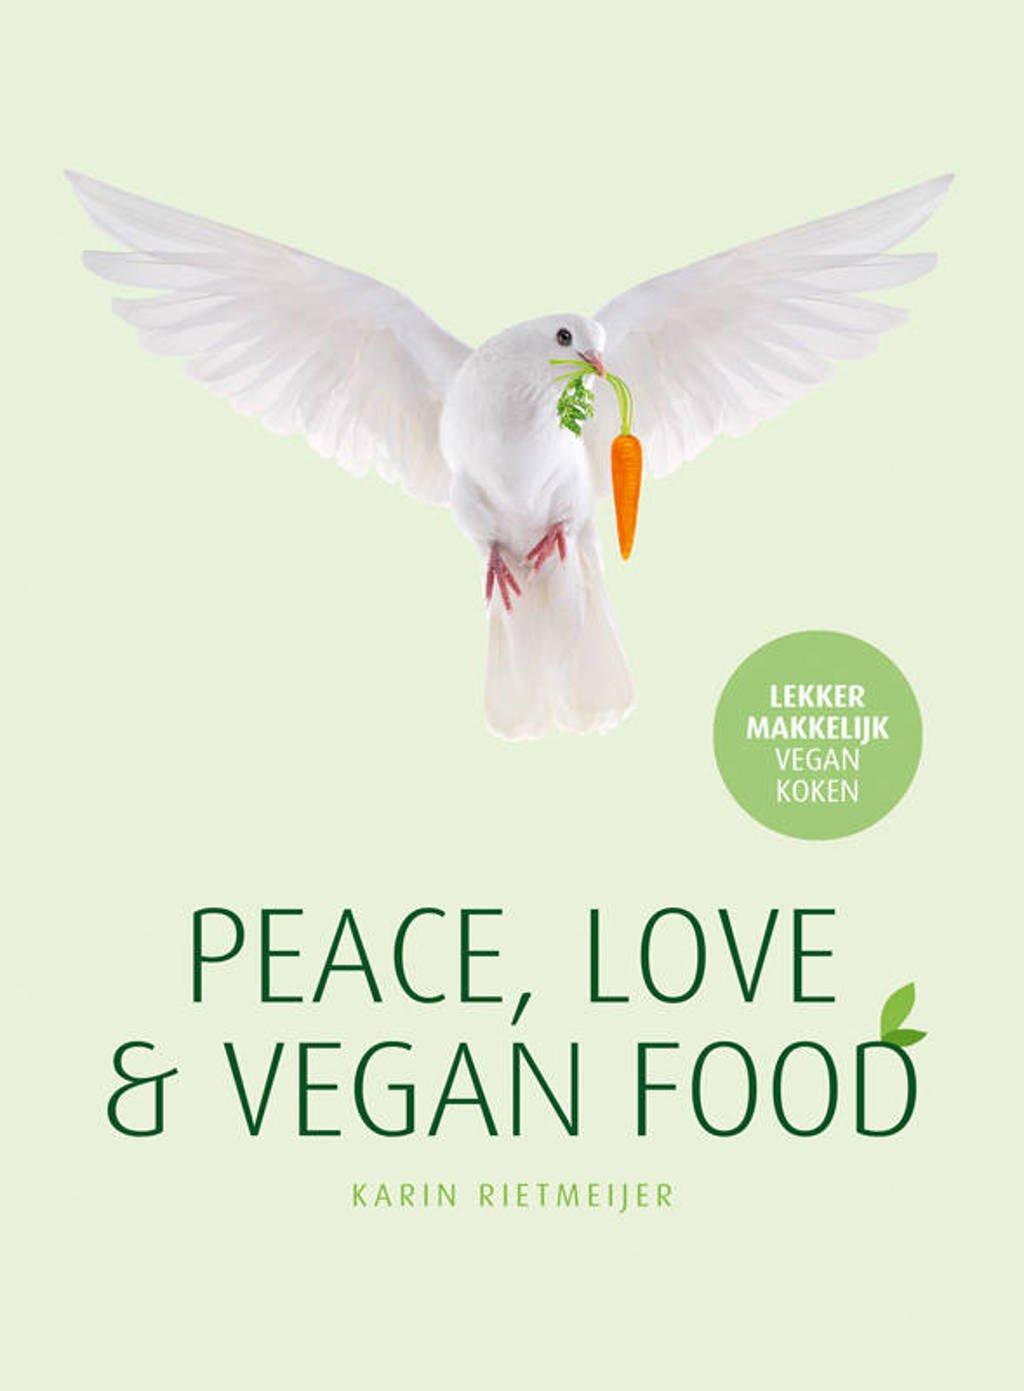 Peace, Love & Vegan Food - Karin Rietmeijer